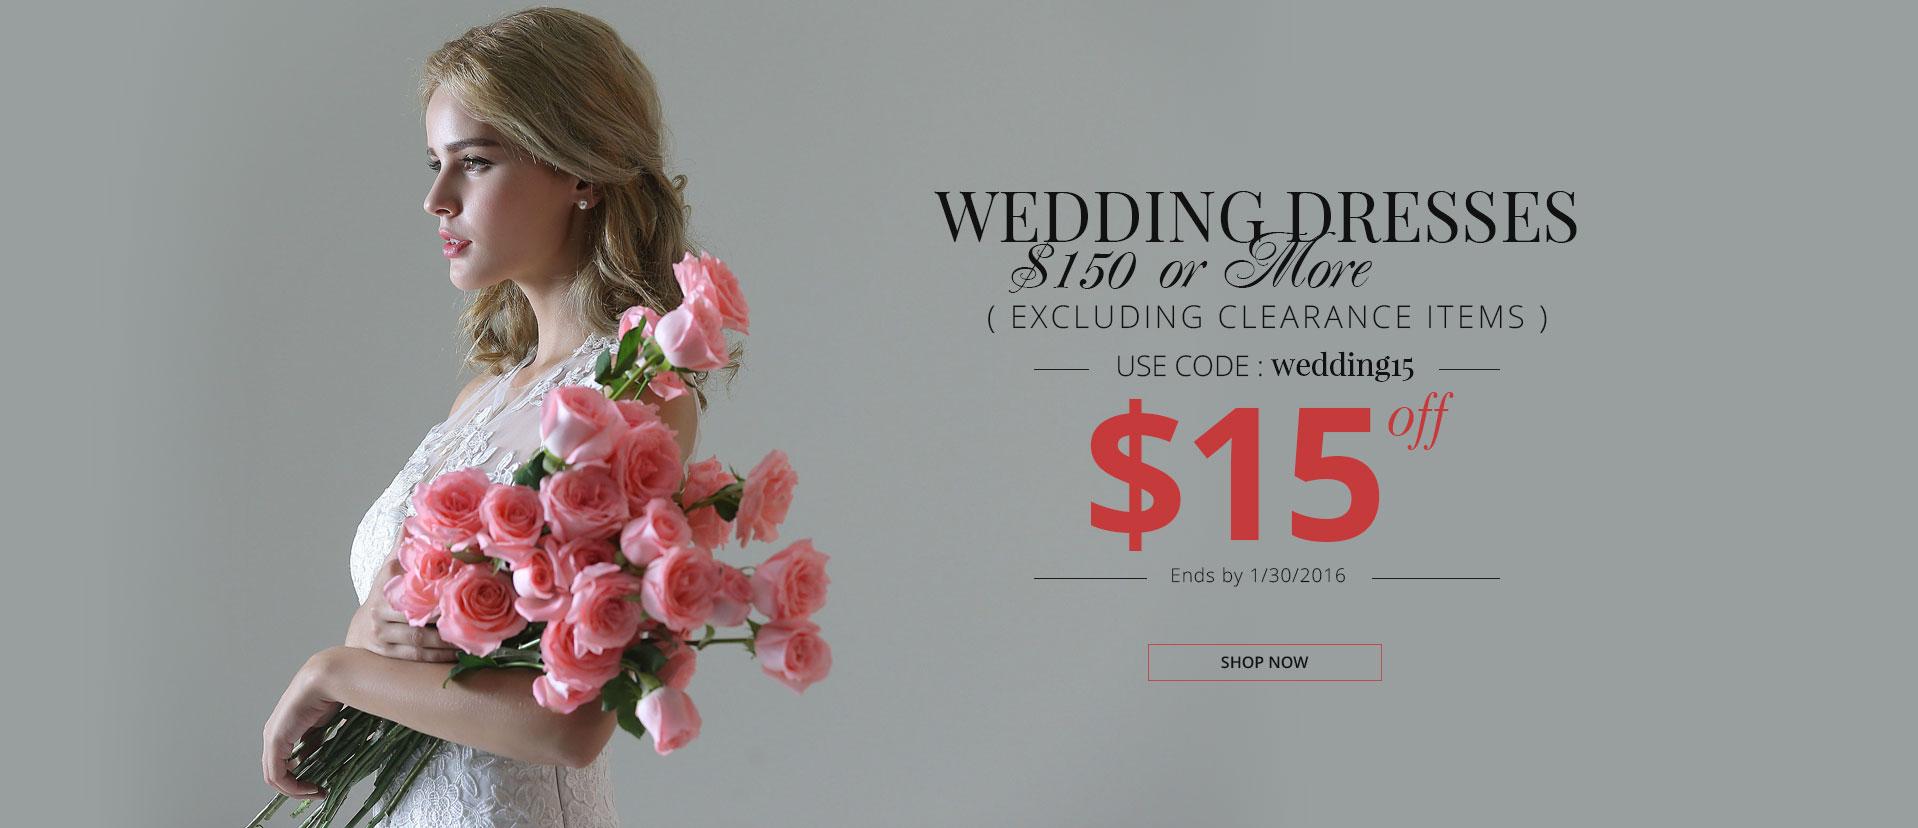 wedding-dresses (1)